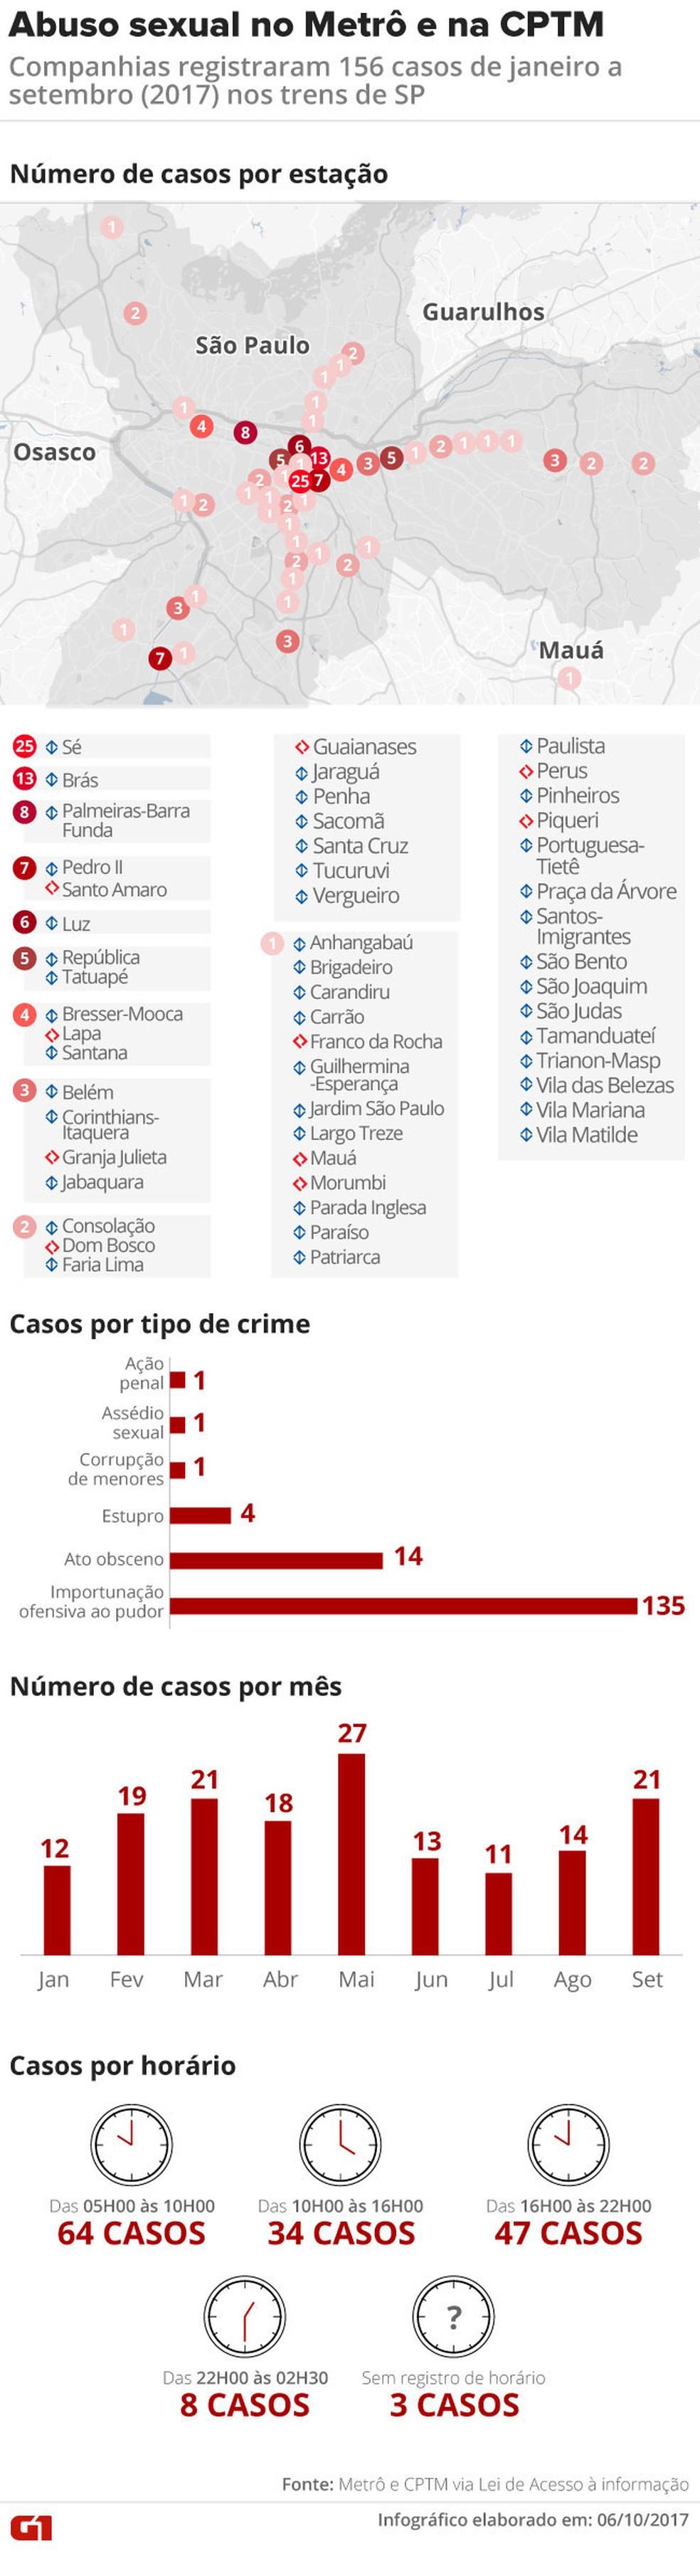 Arte abuso sexual no Metrô e CPTM (Foto: Editoria de Arte/G1)